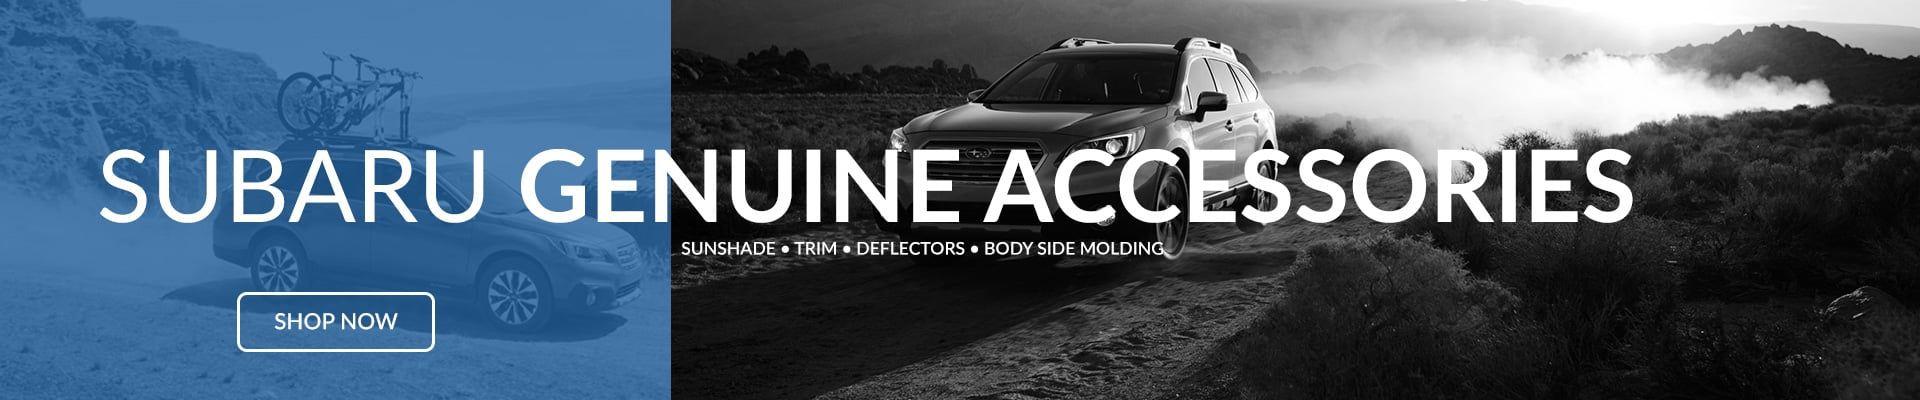 Subaru OEM Accessories